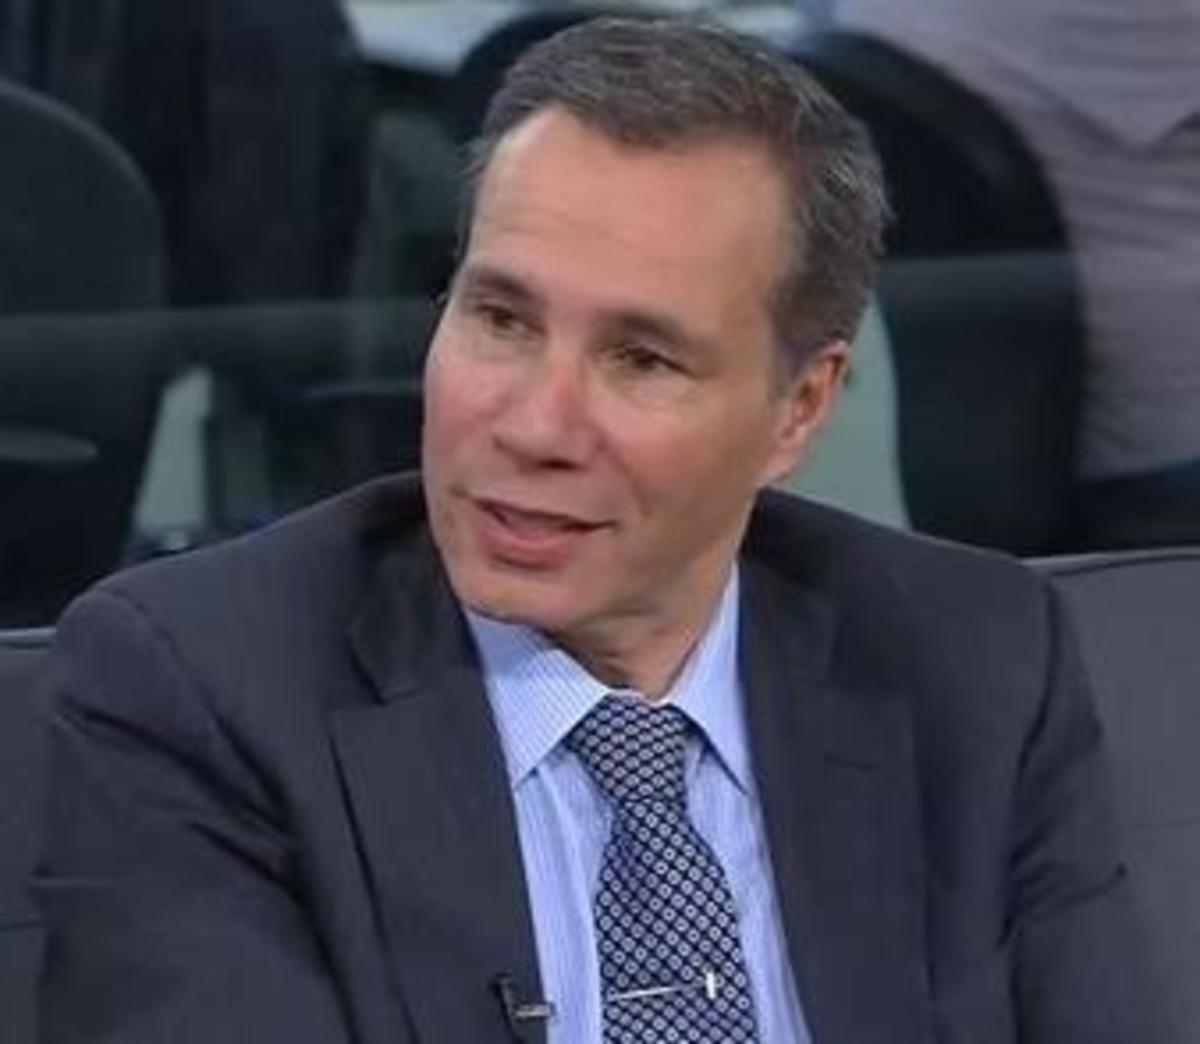 Alberto Nisman as seen on Infobae, a news website. (Photo: Wikimedia Commons)